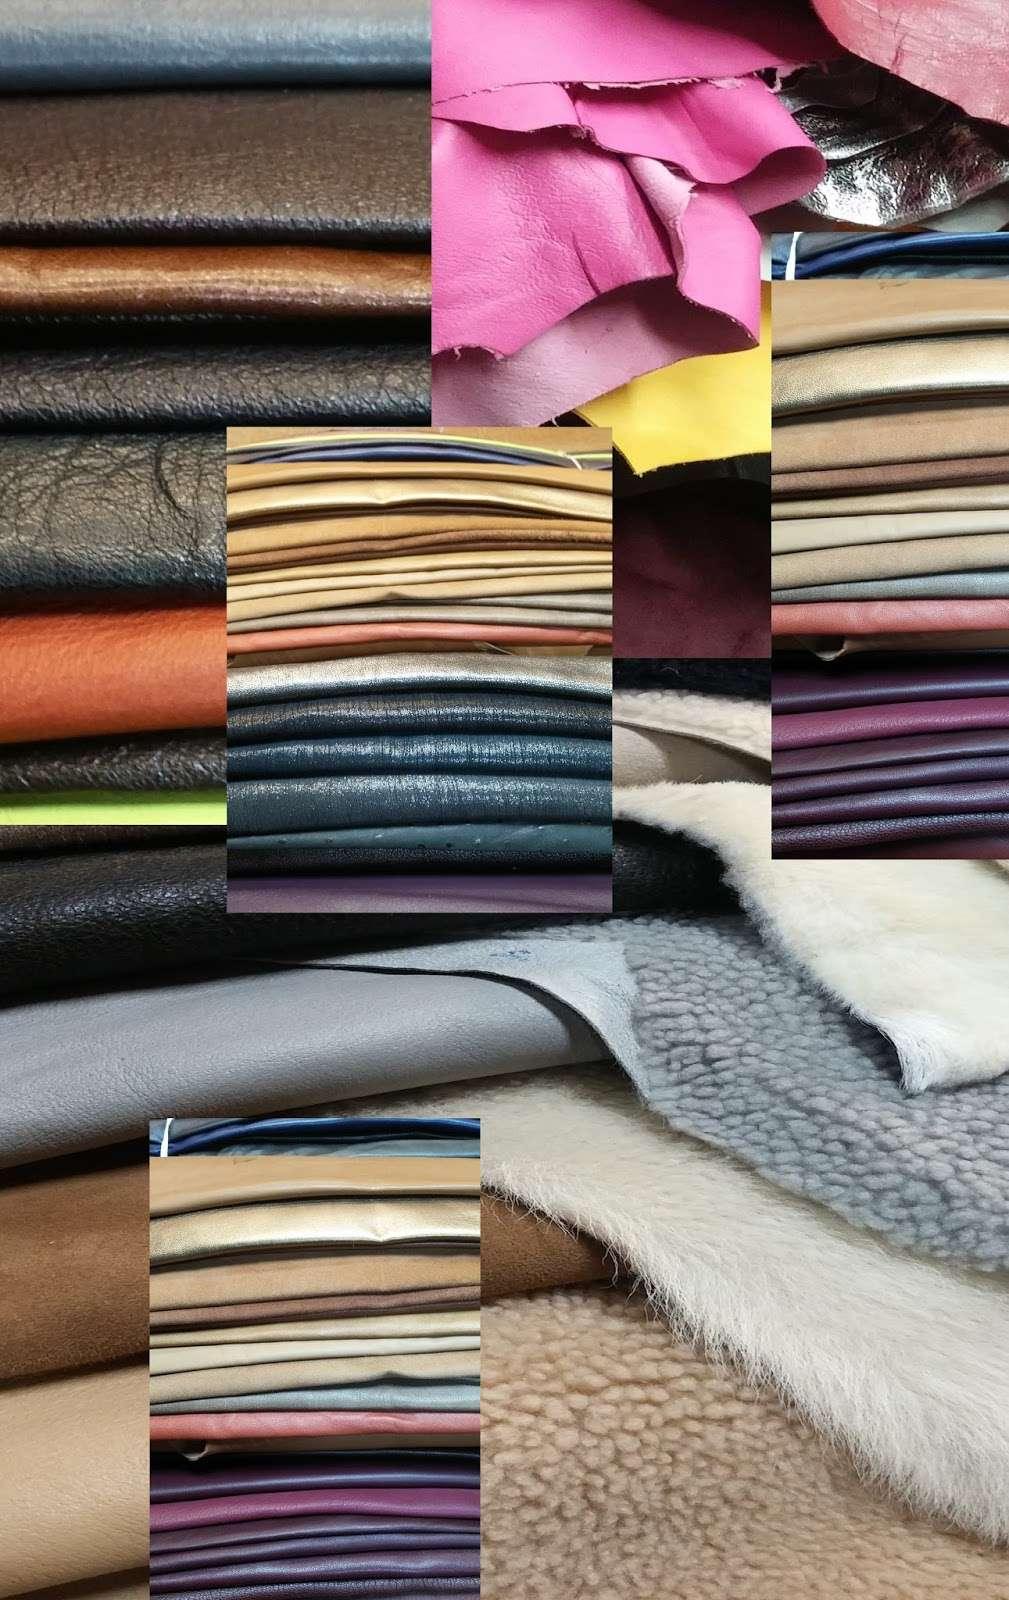 Global Leathers (Warehouse) - storage  | Photo 1 of 2 | Address: 2136, 501 Penhorn Ave #5, Secaucus, NJ 07094, USA | Phone: (201) 552-2715